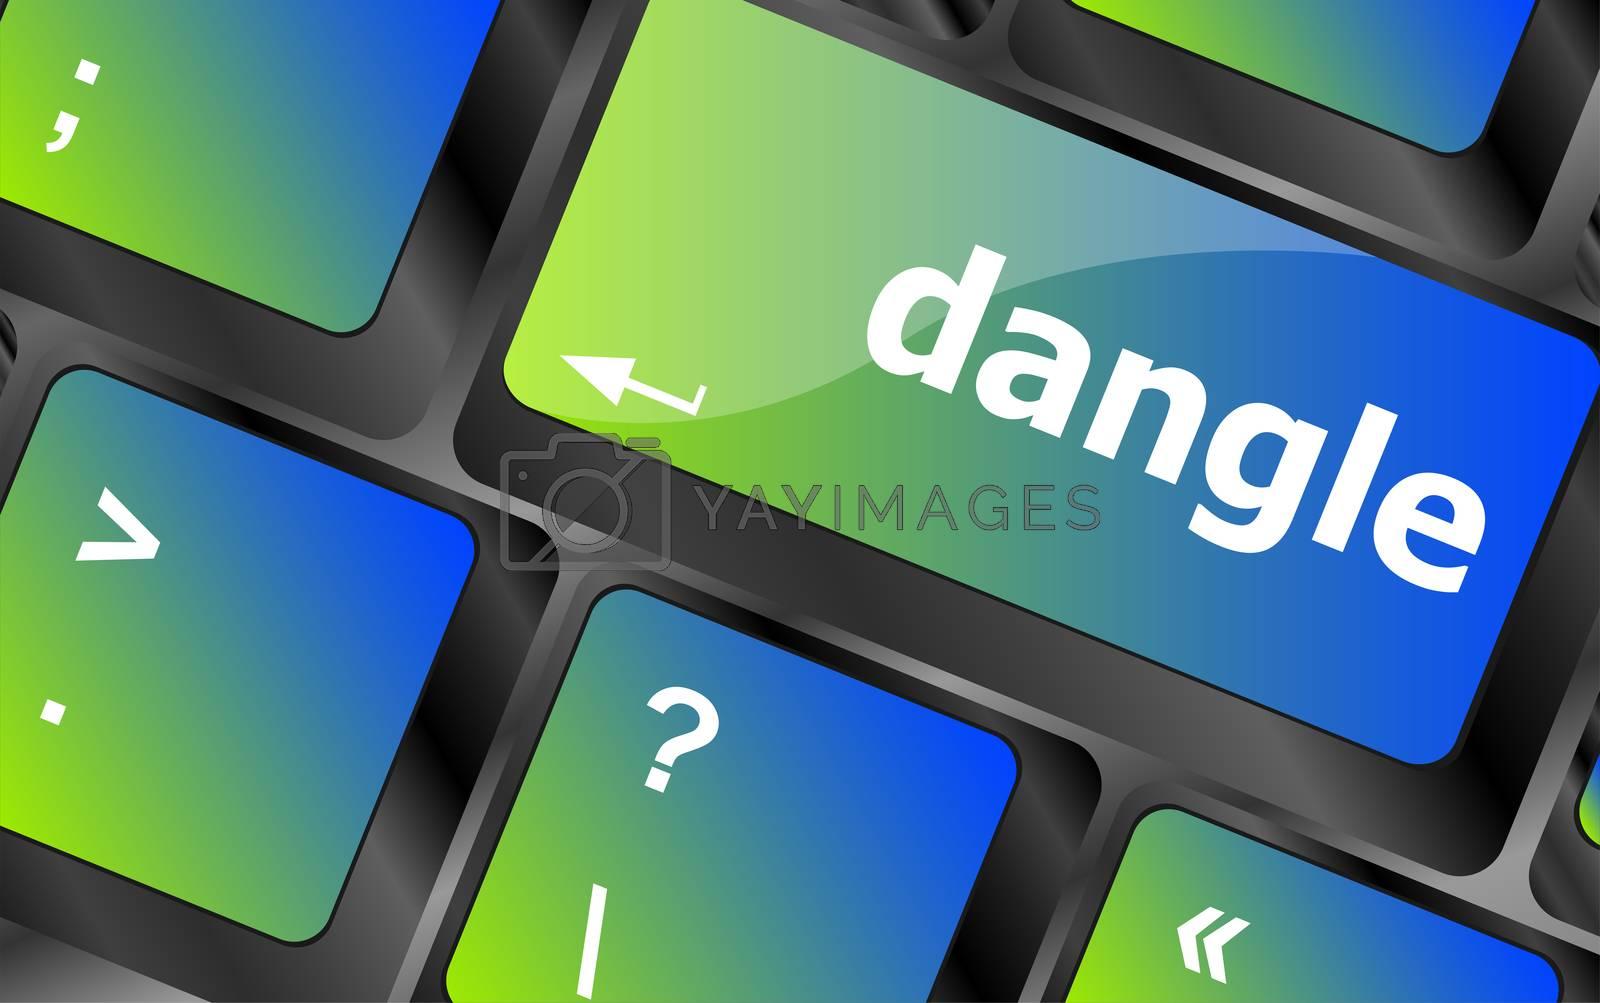 dangle word on computer keyboard key